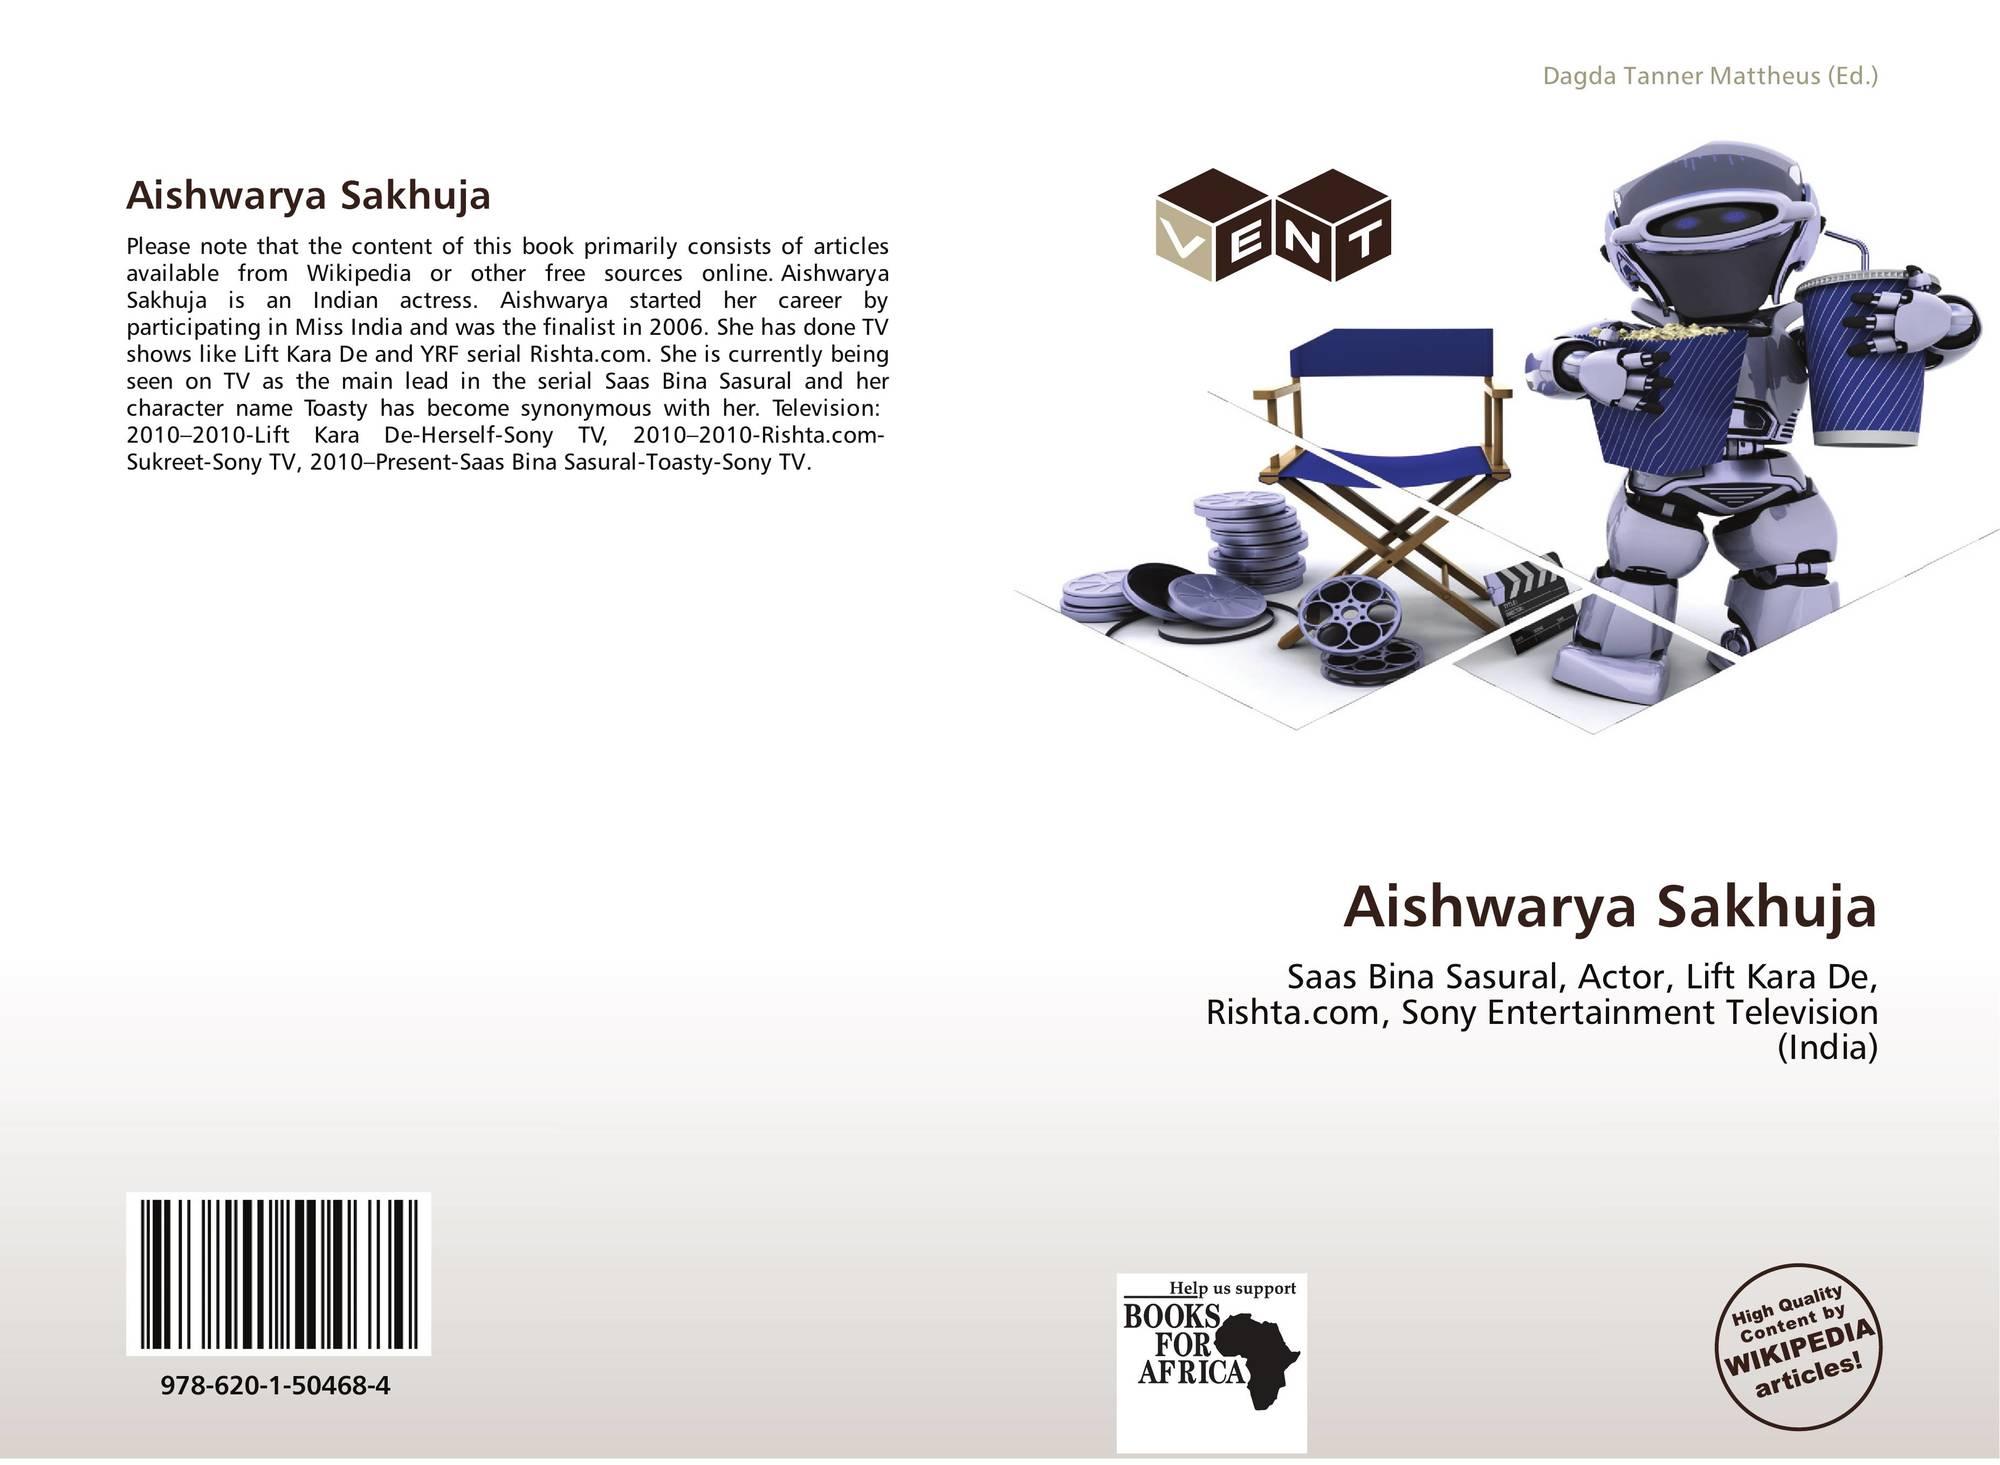 Communication on this topic: Anchal Joseph, sathyabhama/